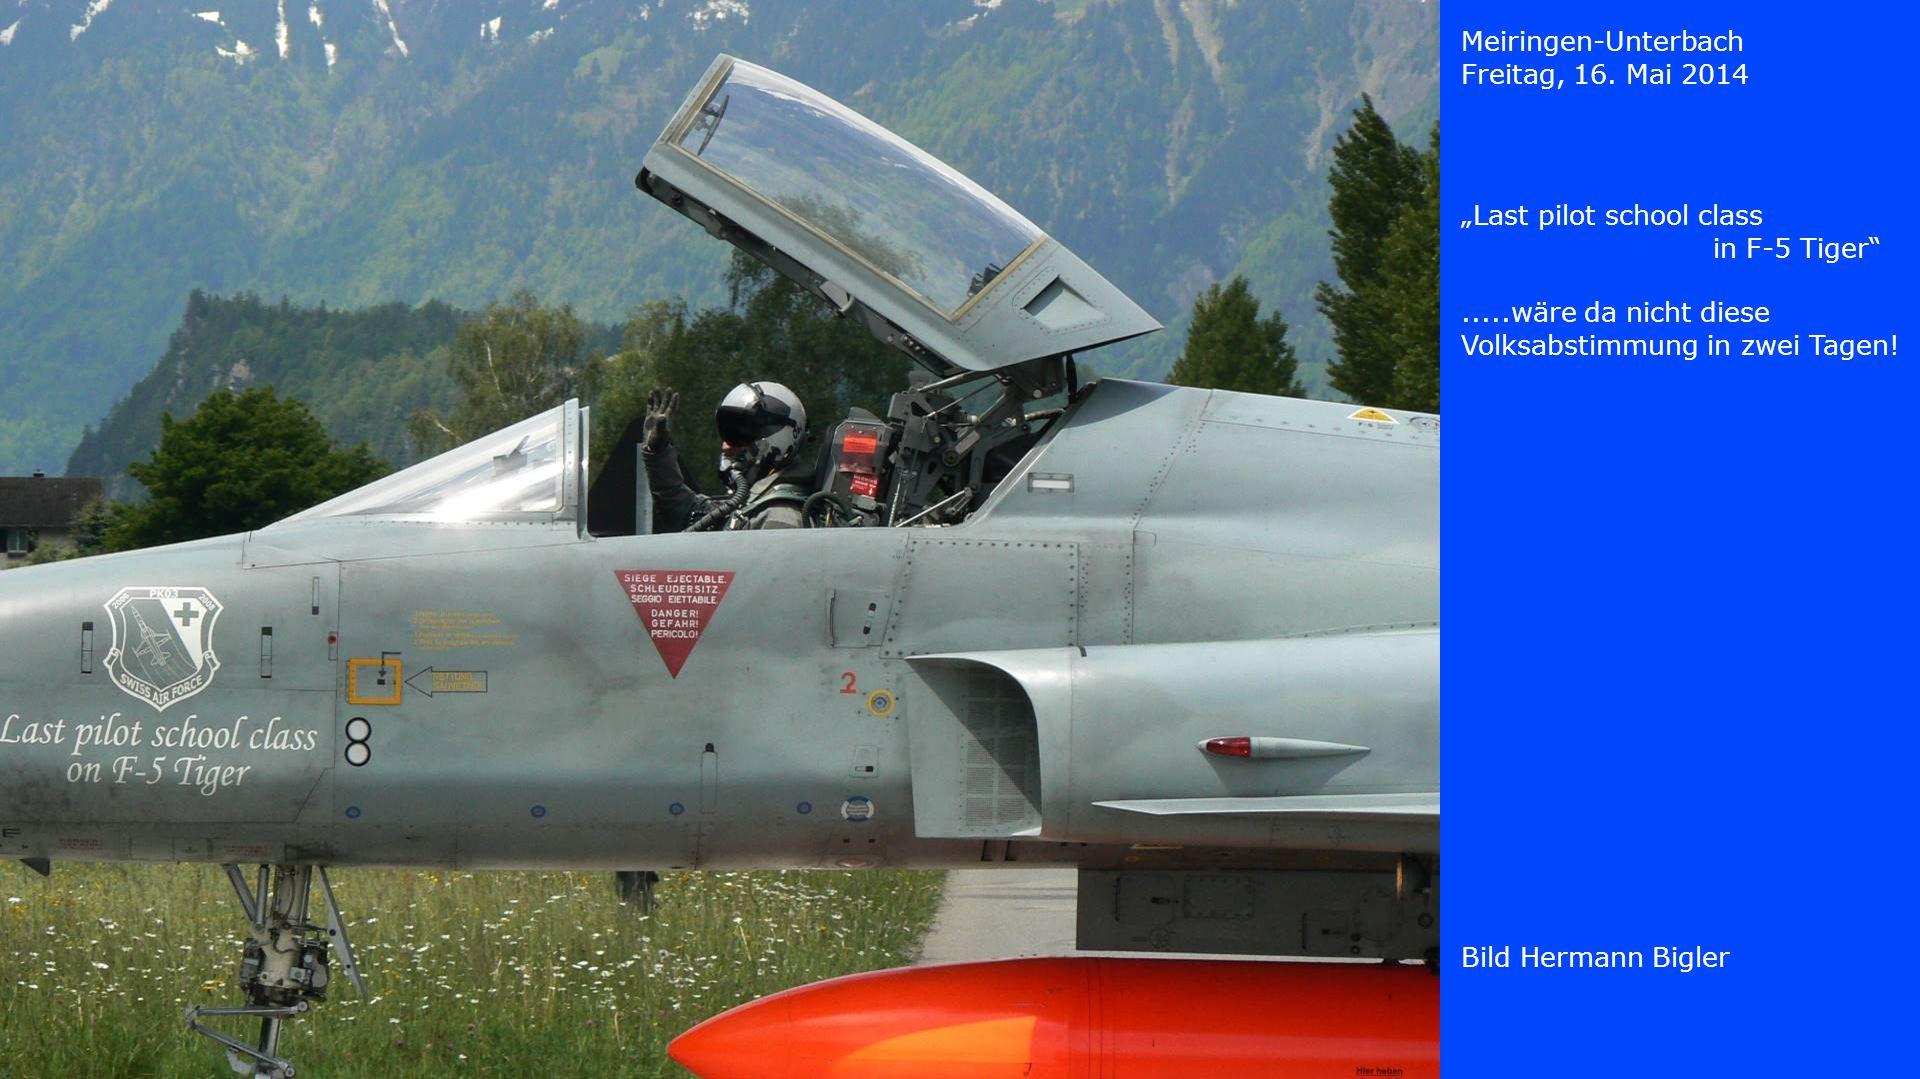 "Meiringen-Unterbach Freitag, 16. Mai 2014. ""Last pilot school class in F-5 Tiger"